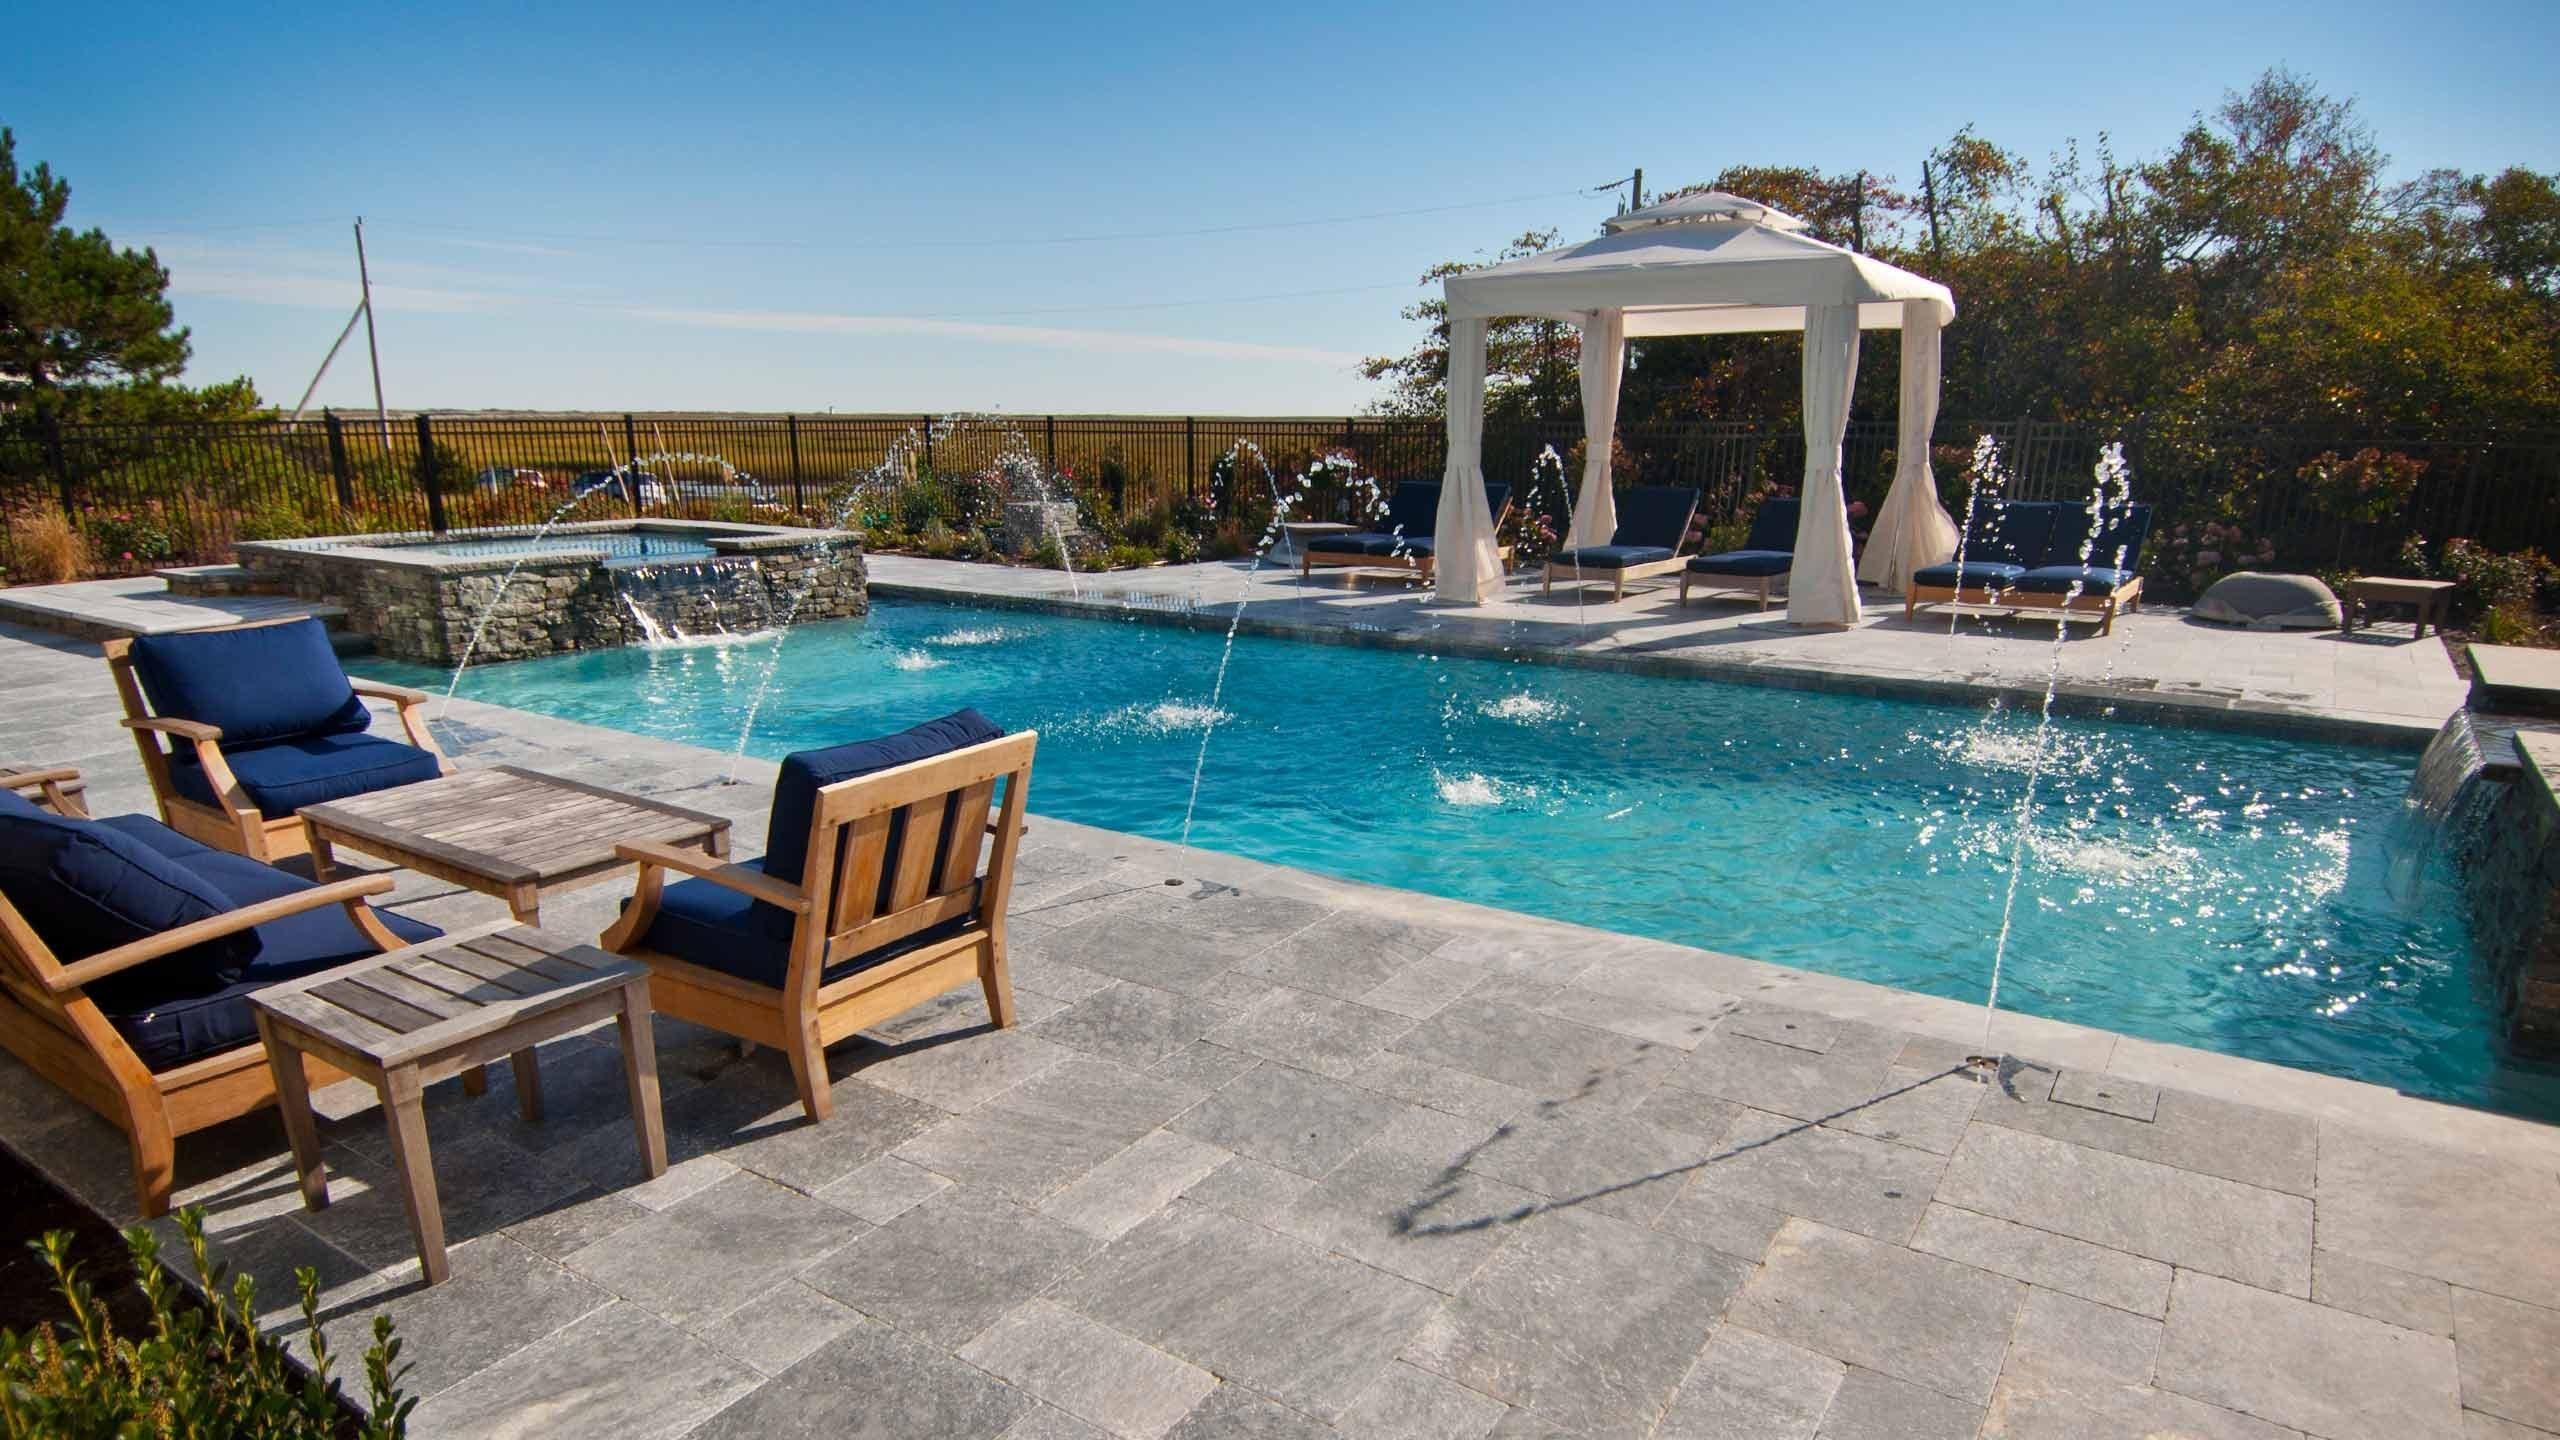 Outdoor pool overlooking the water in Provincetown